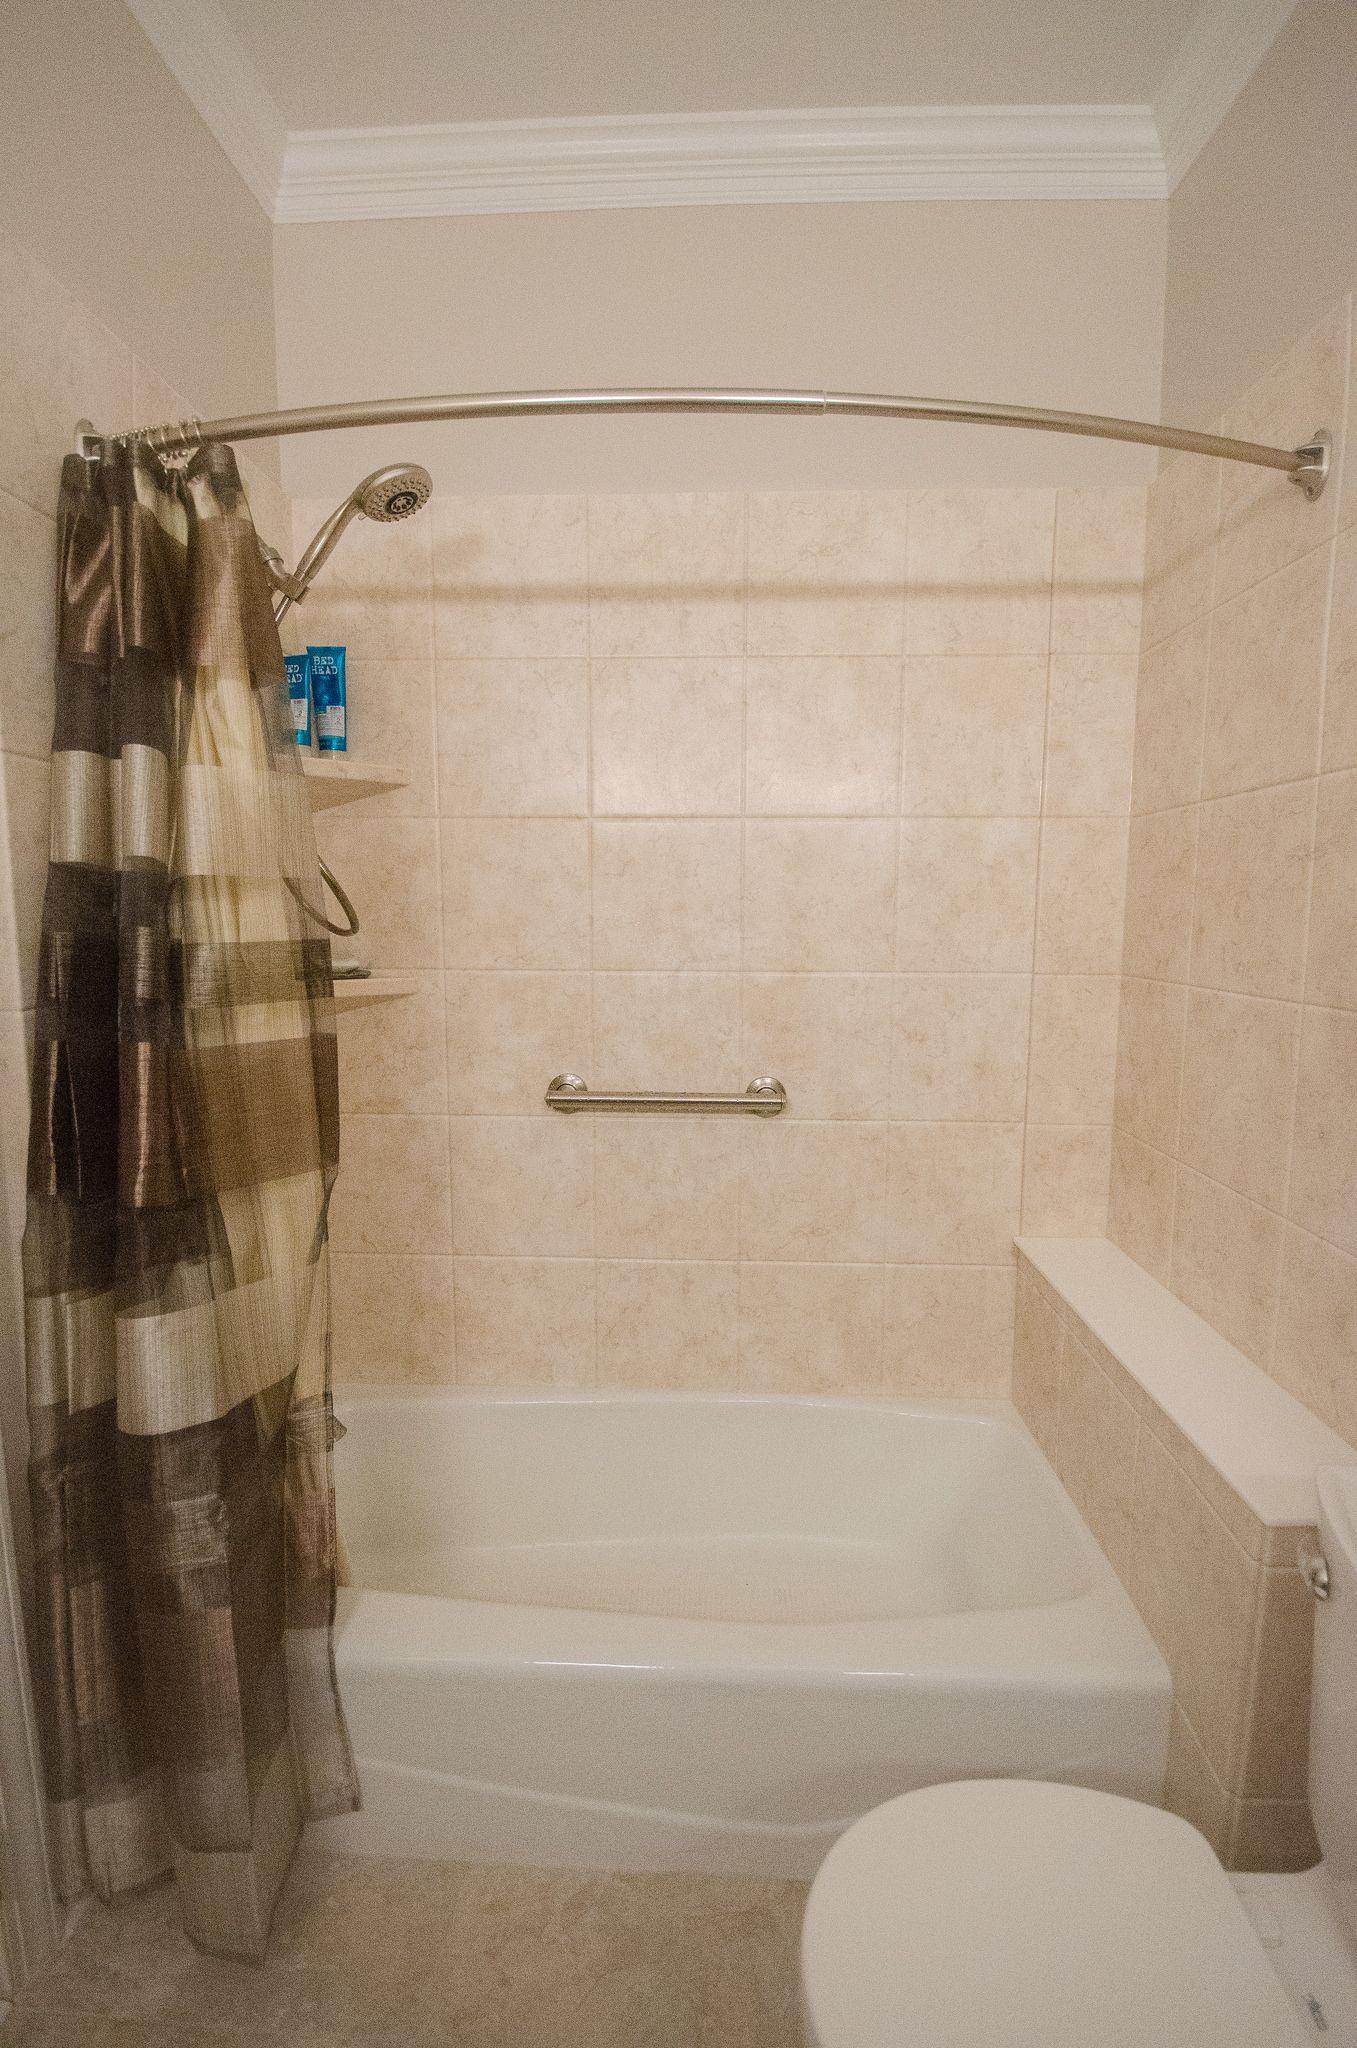 Rh894 After 0060 In 2019 Bathroom Remodel Ideas